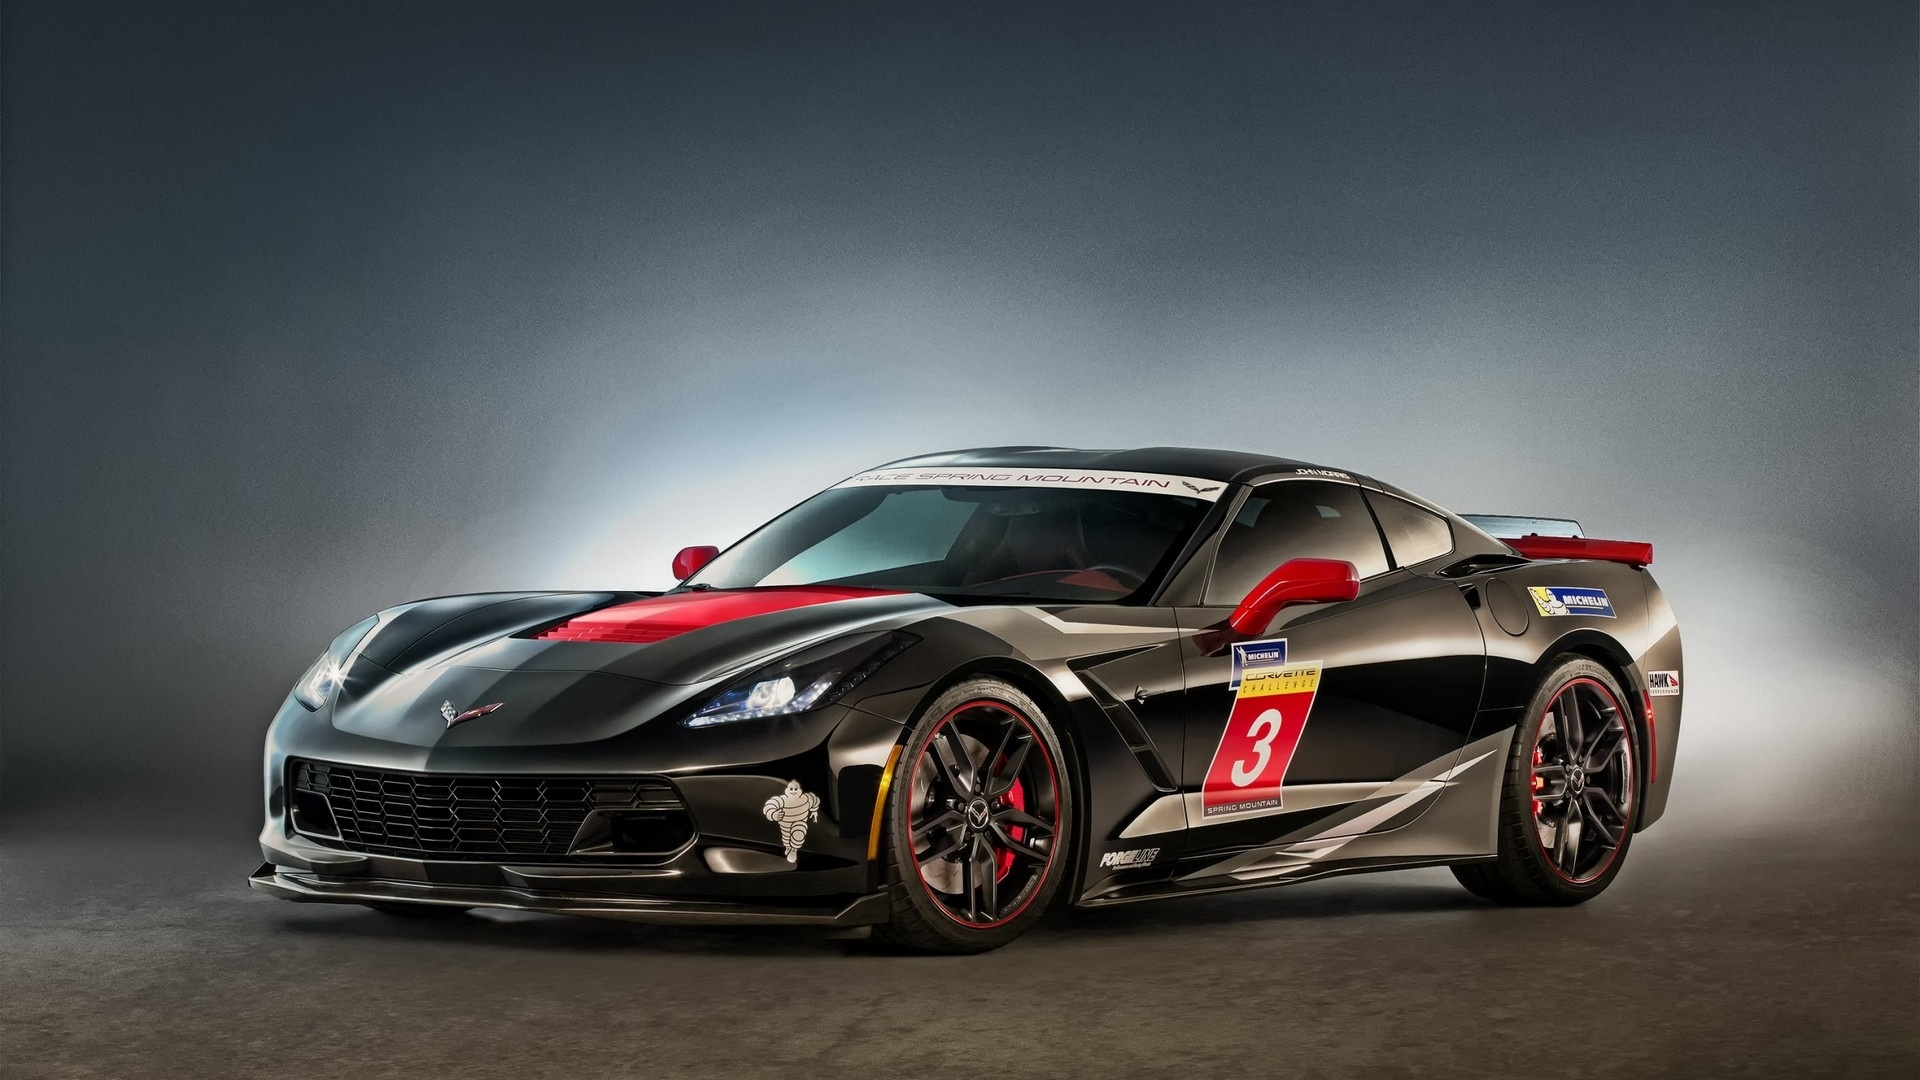 Corvette free image